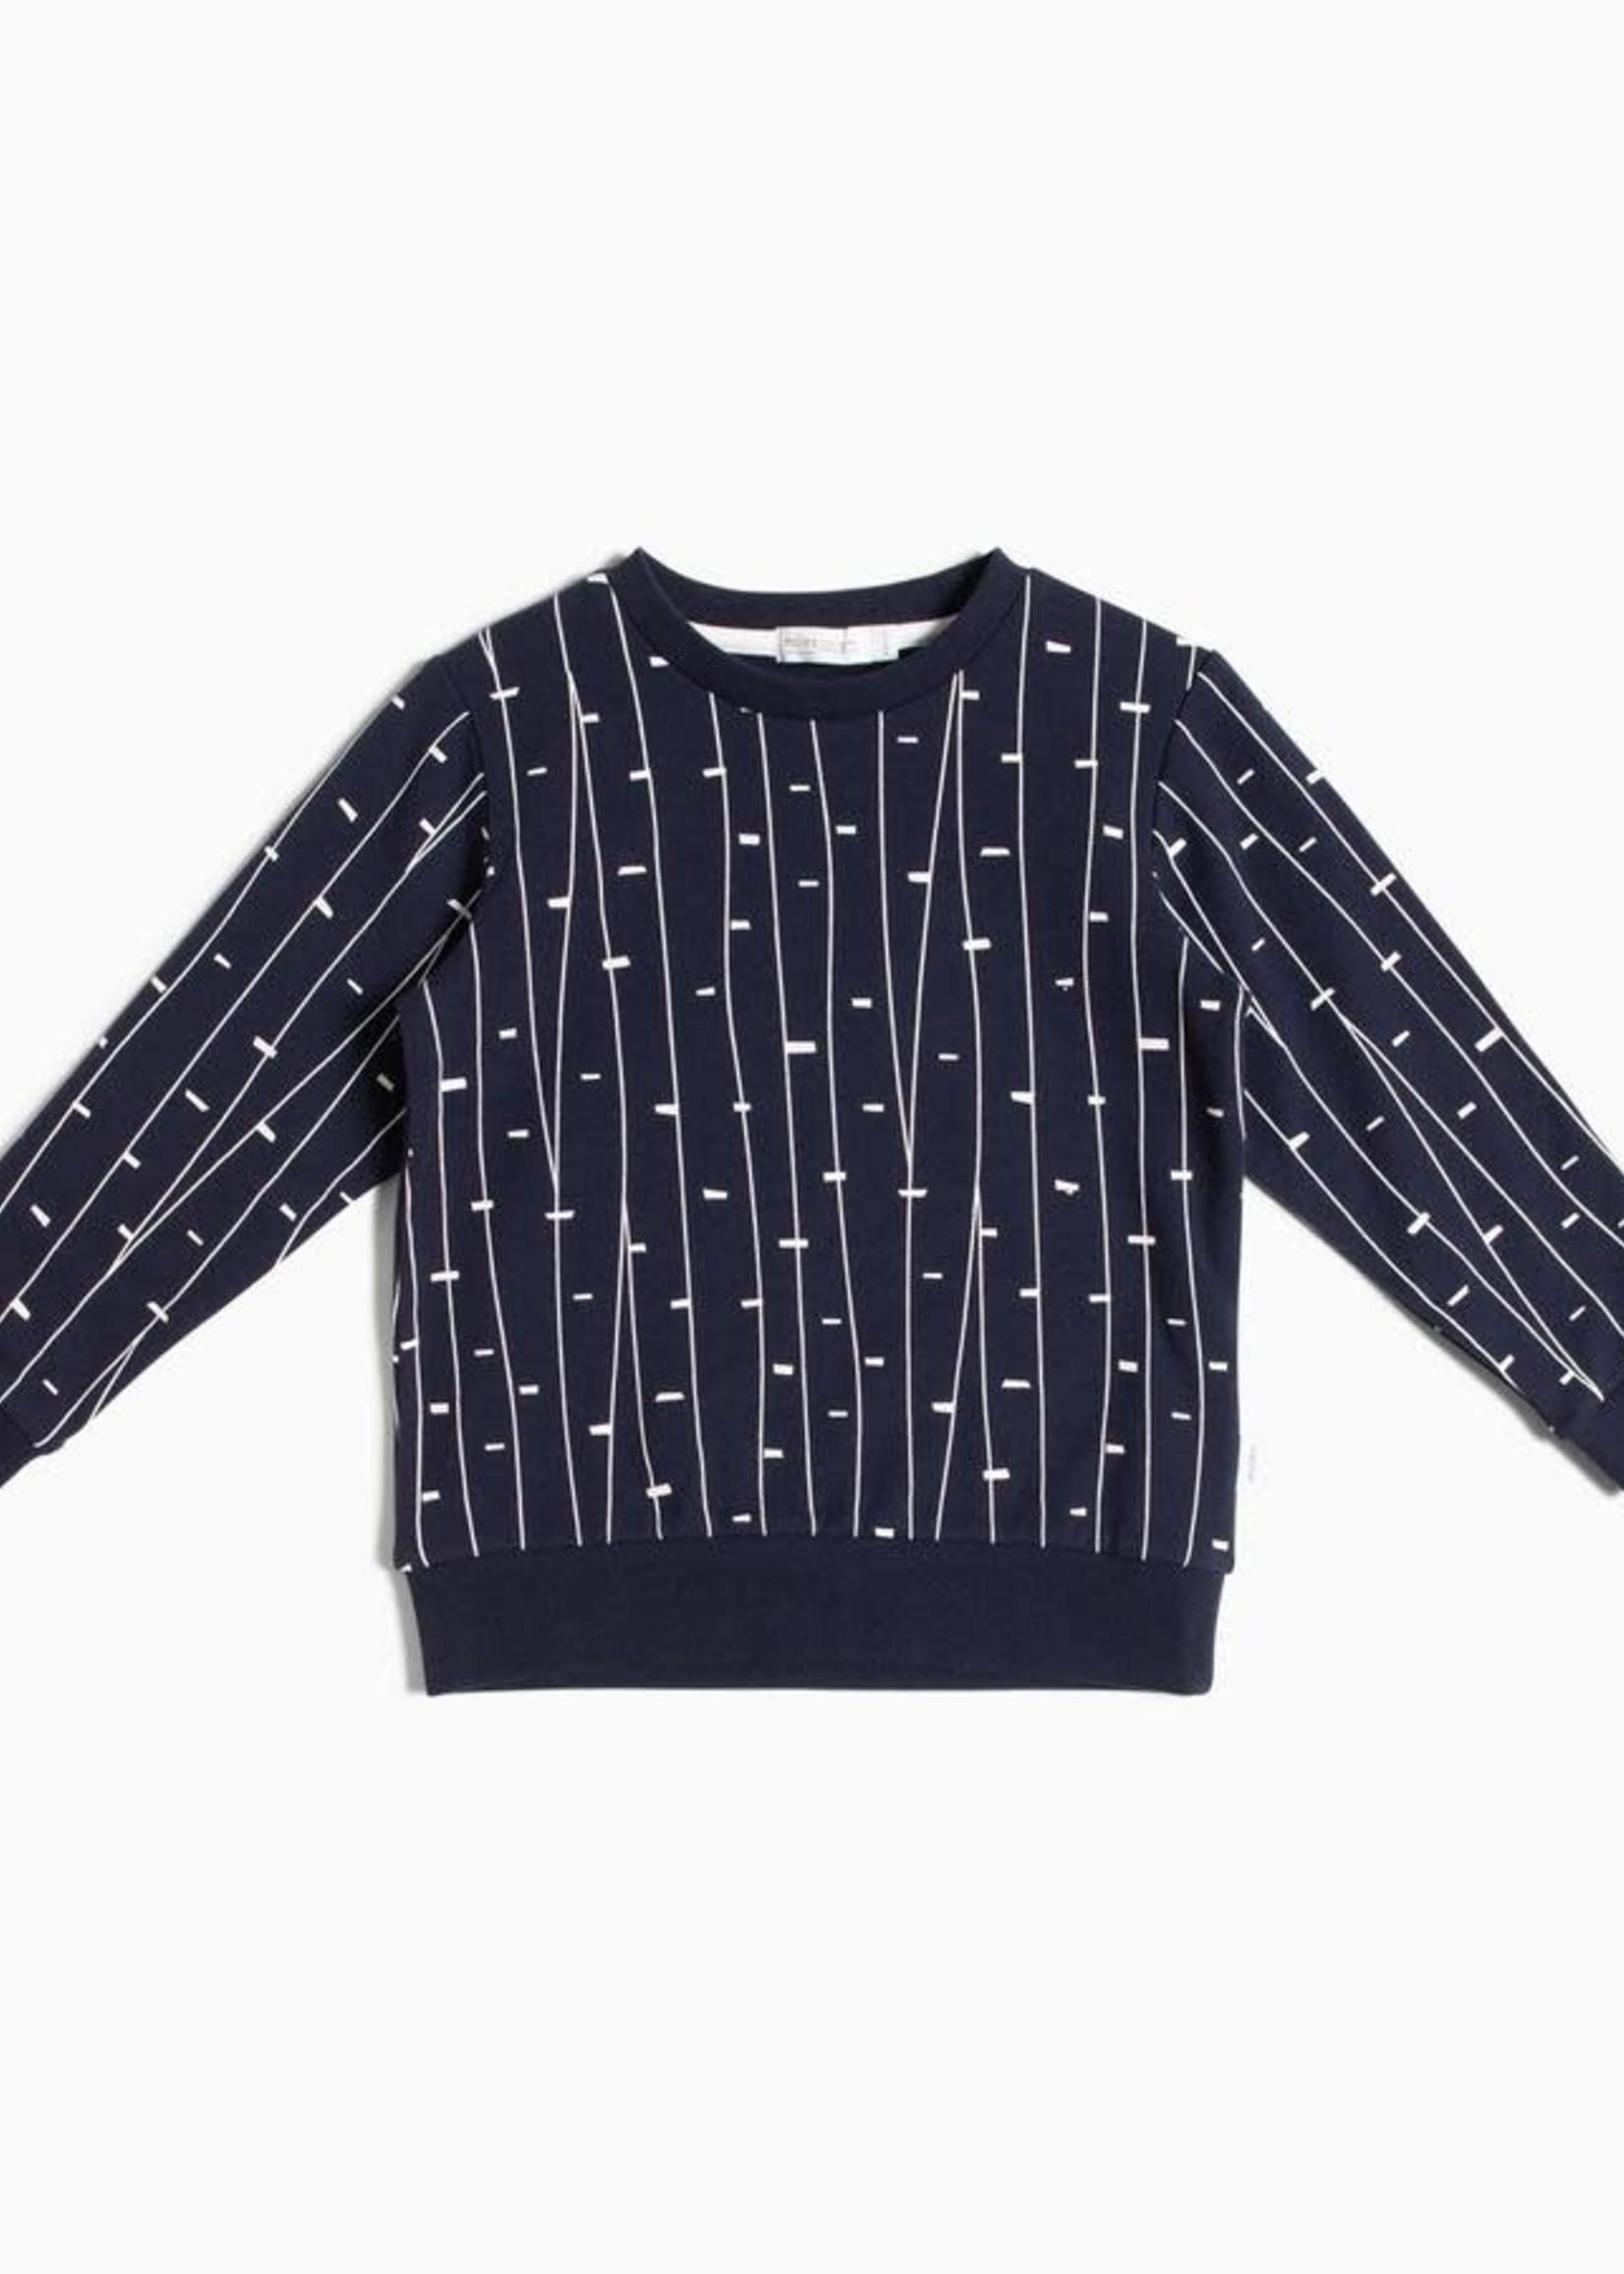 Miles Baby MB Navy Twiglet Sweater